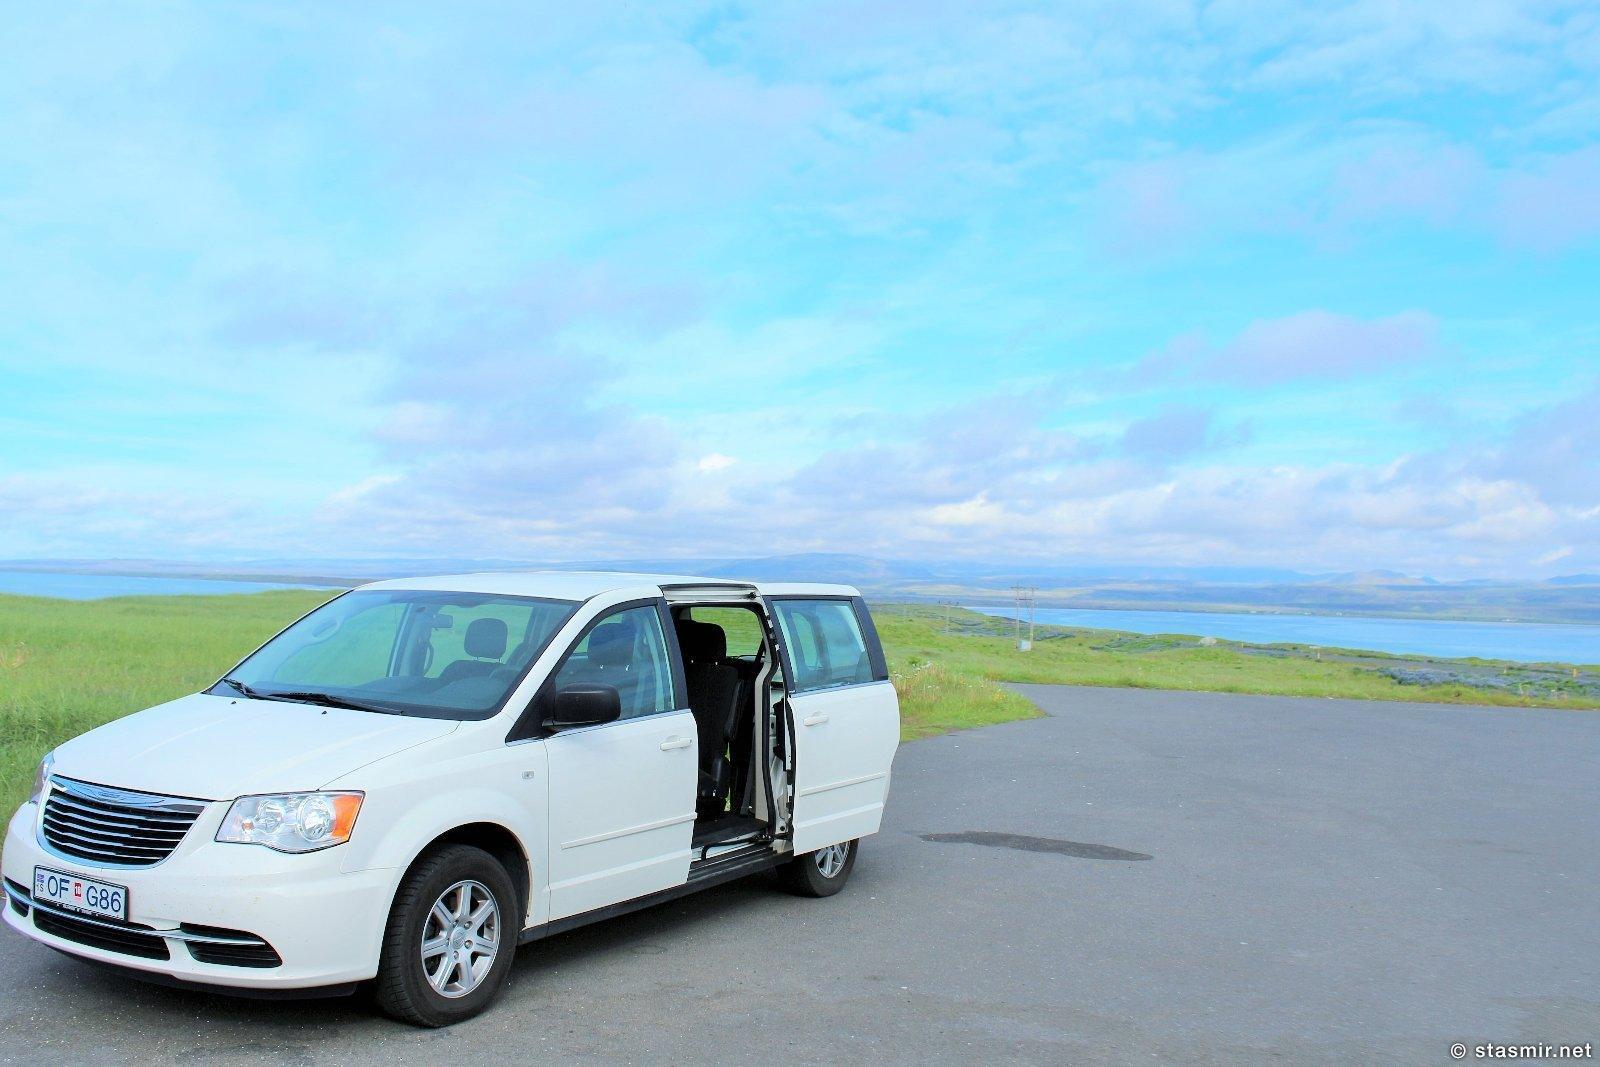 Chrysler Town and Country Minivan у ресторана Hafið Bláa, Eyrarbakkavegur, Исландия,Маршрут Южный Берег, фото Стасмир, Photo Stasmir